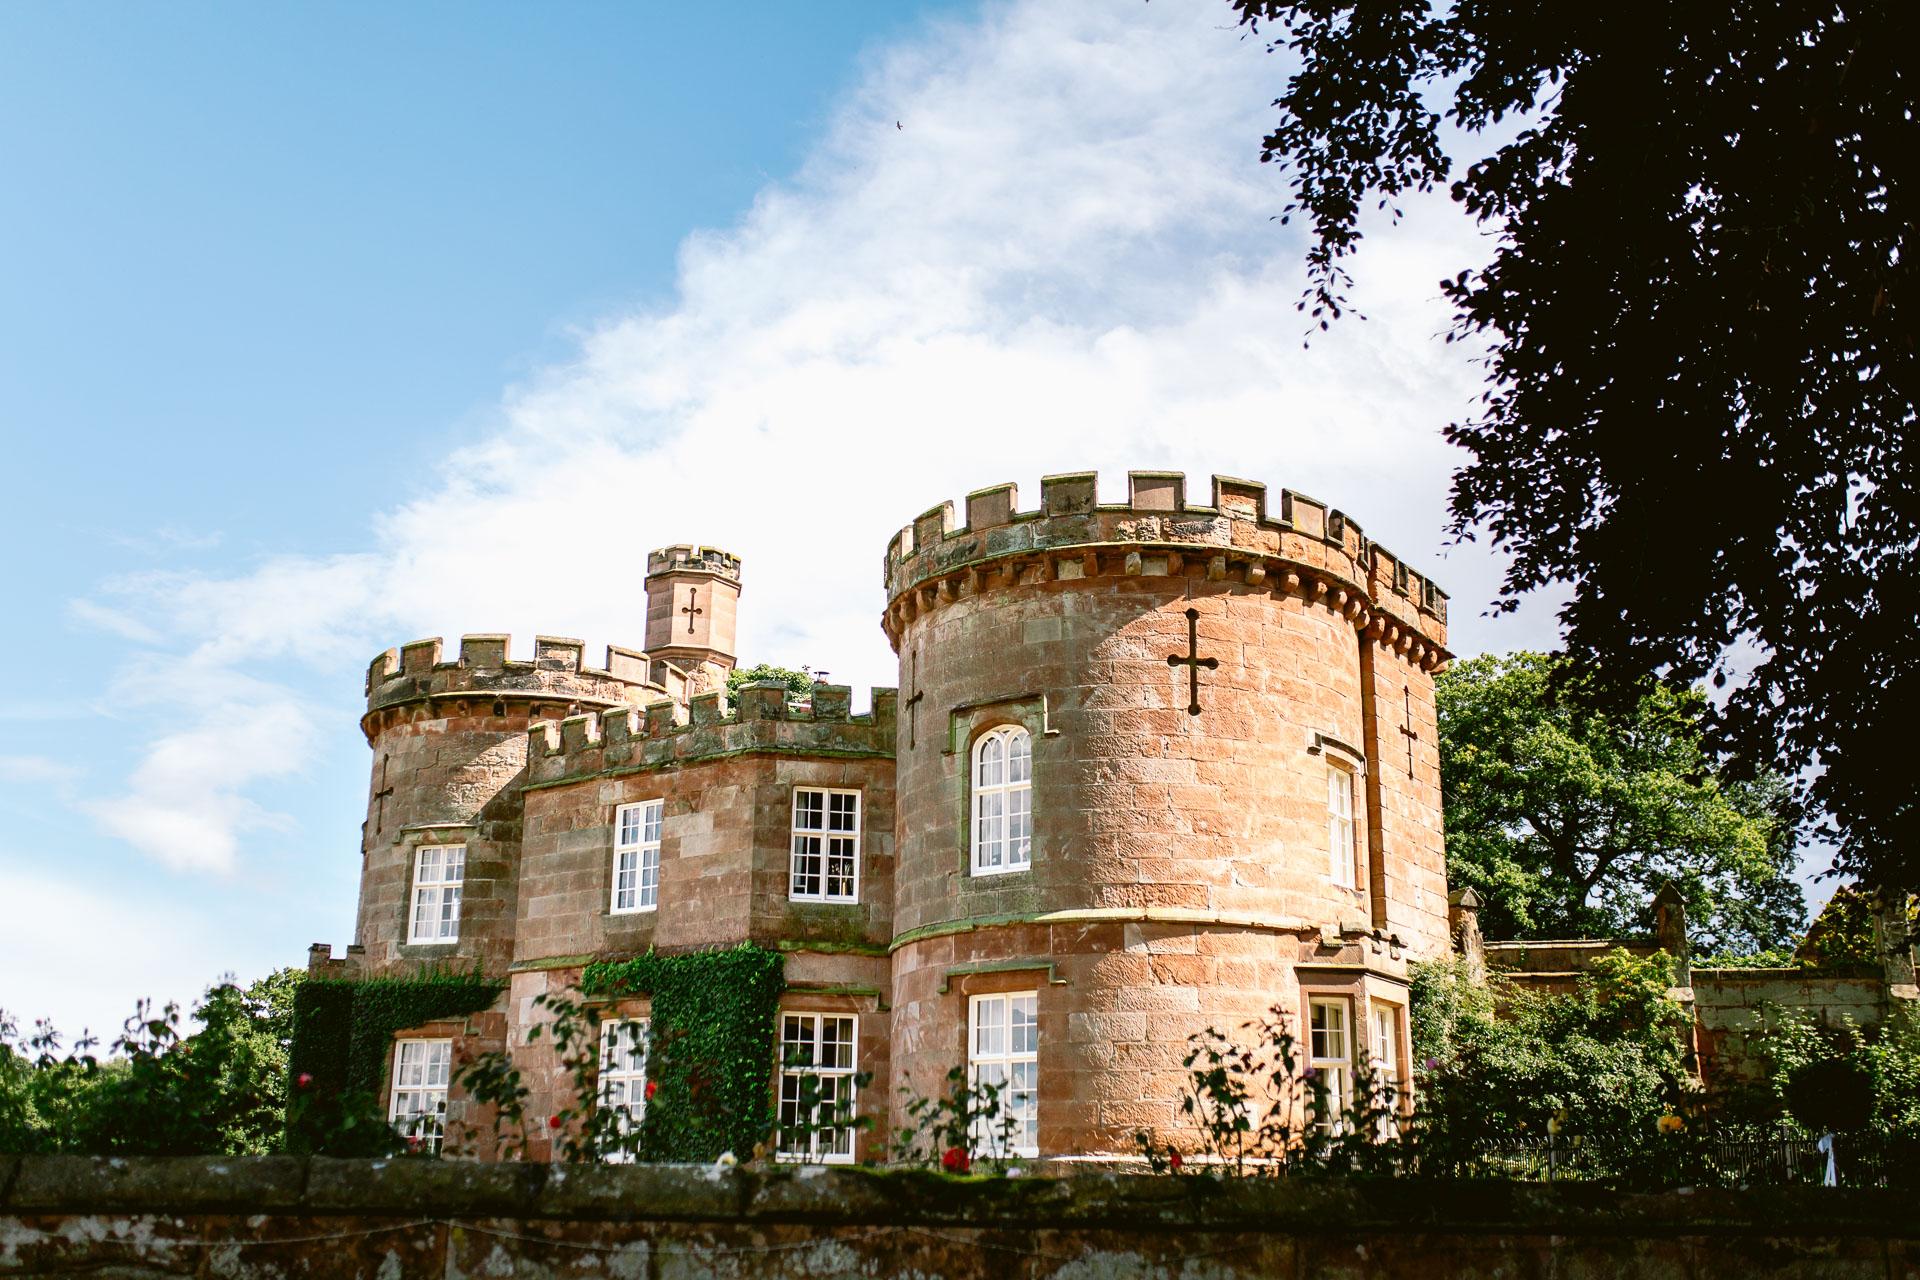 The Citadel wedding Shropshire Sarah-Jane and Steve wedding venue the citadel with a beautiful blue sky